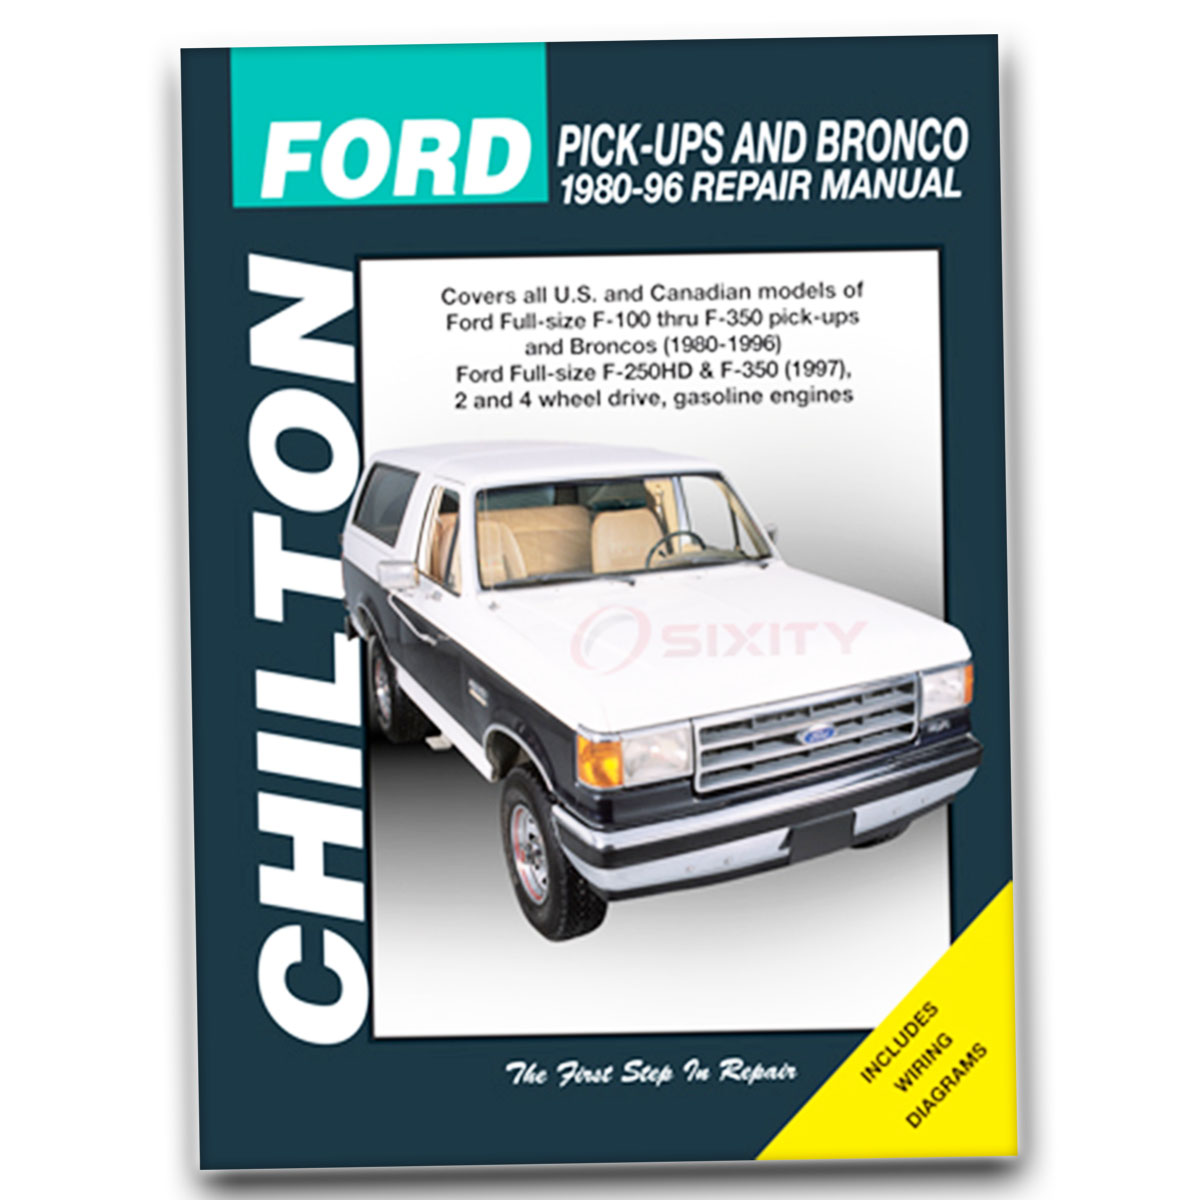 Chilton Repair Manual for Ford F-350 XL Custom Eddie Bauer XLT Lariat nl